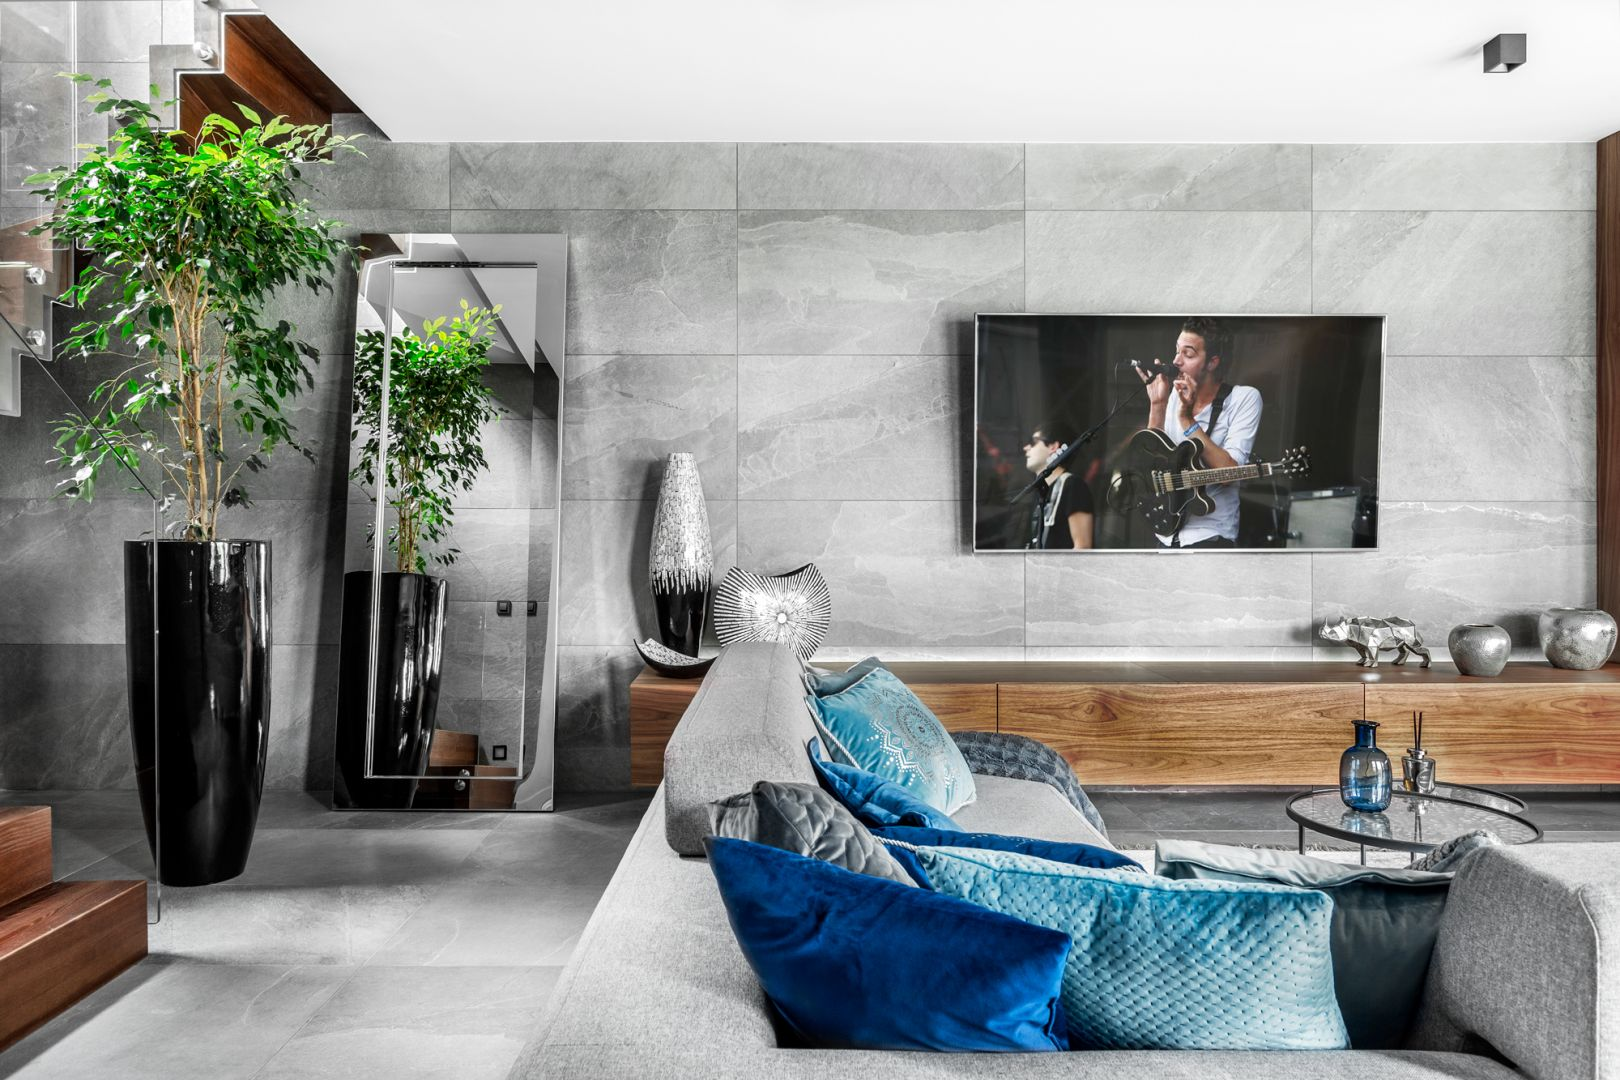 Telewizor w salonie. Projekt Agnieszka Morawiec. Fot. Dekorialove